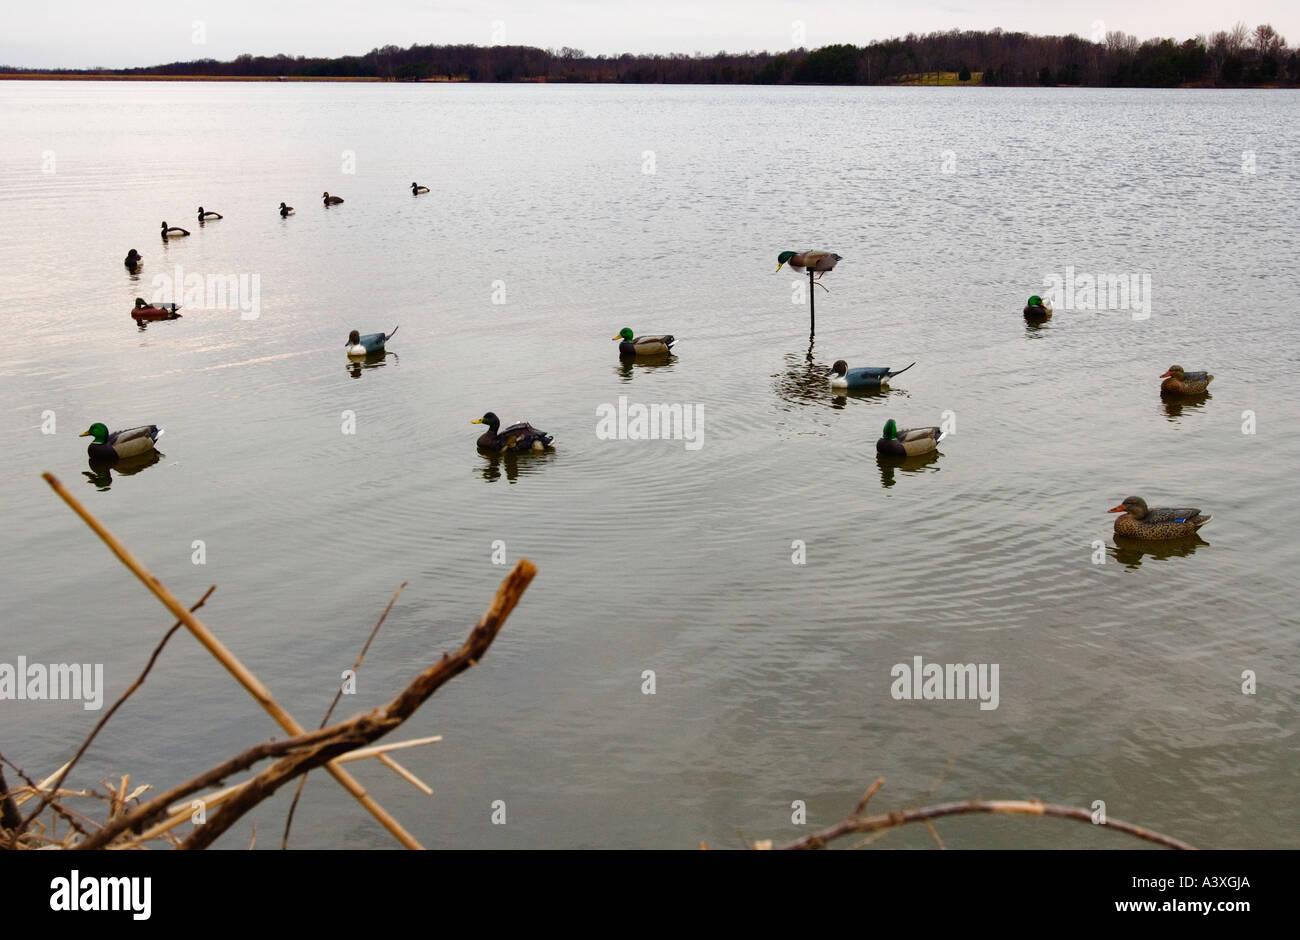 S Blind But He Stockfotos & S Blind But He Bilder - Seite 3 - Alamy